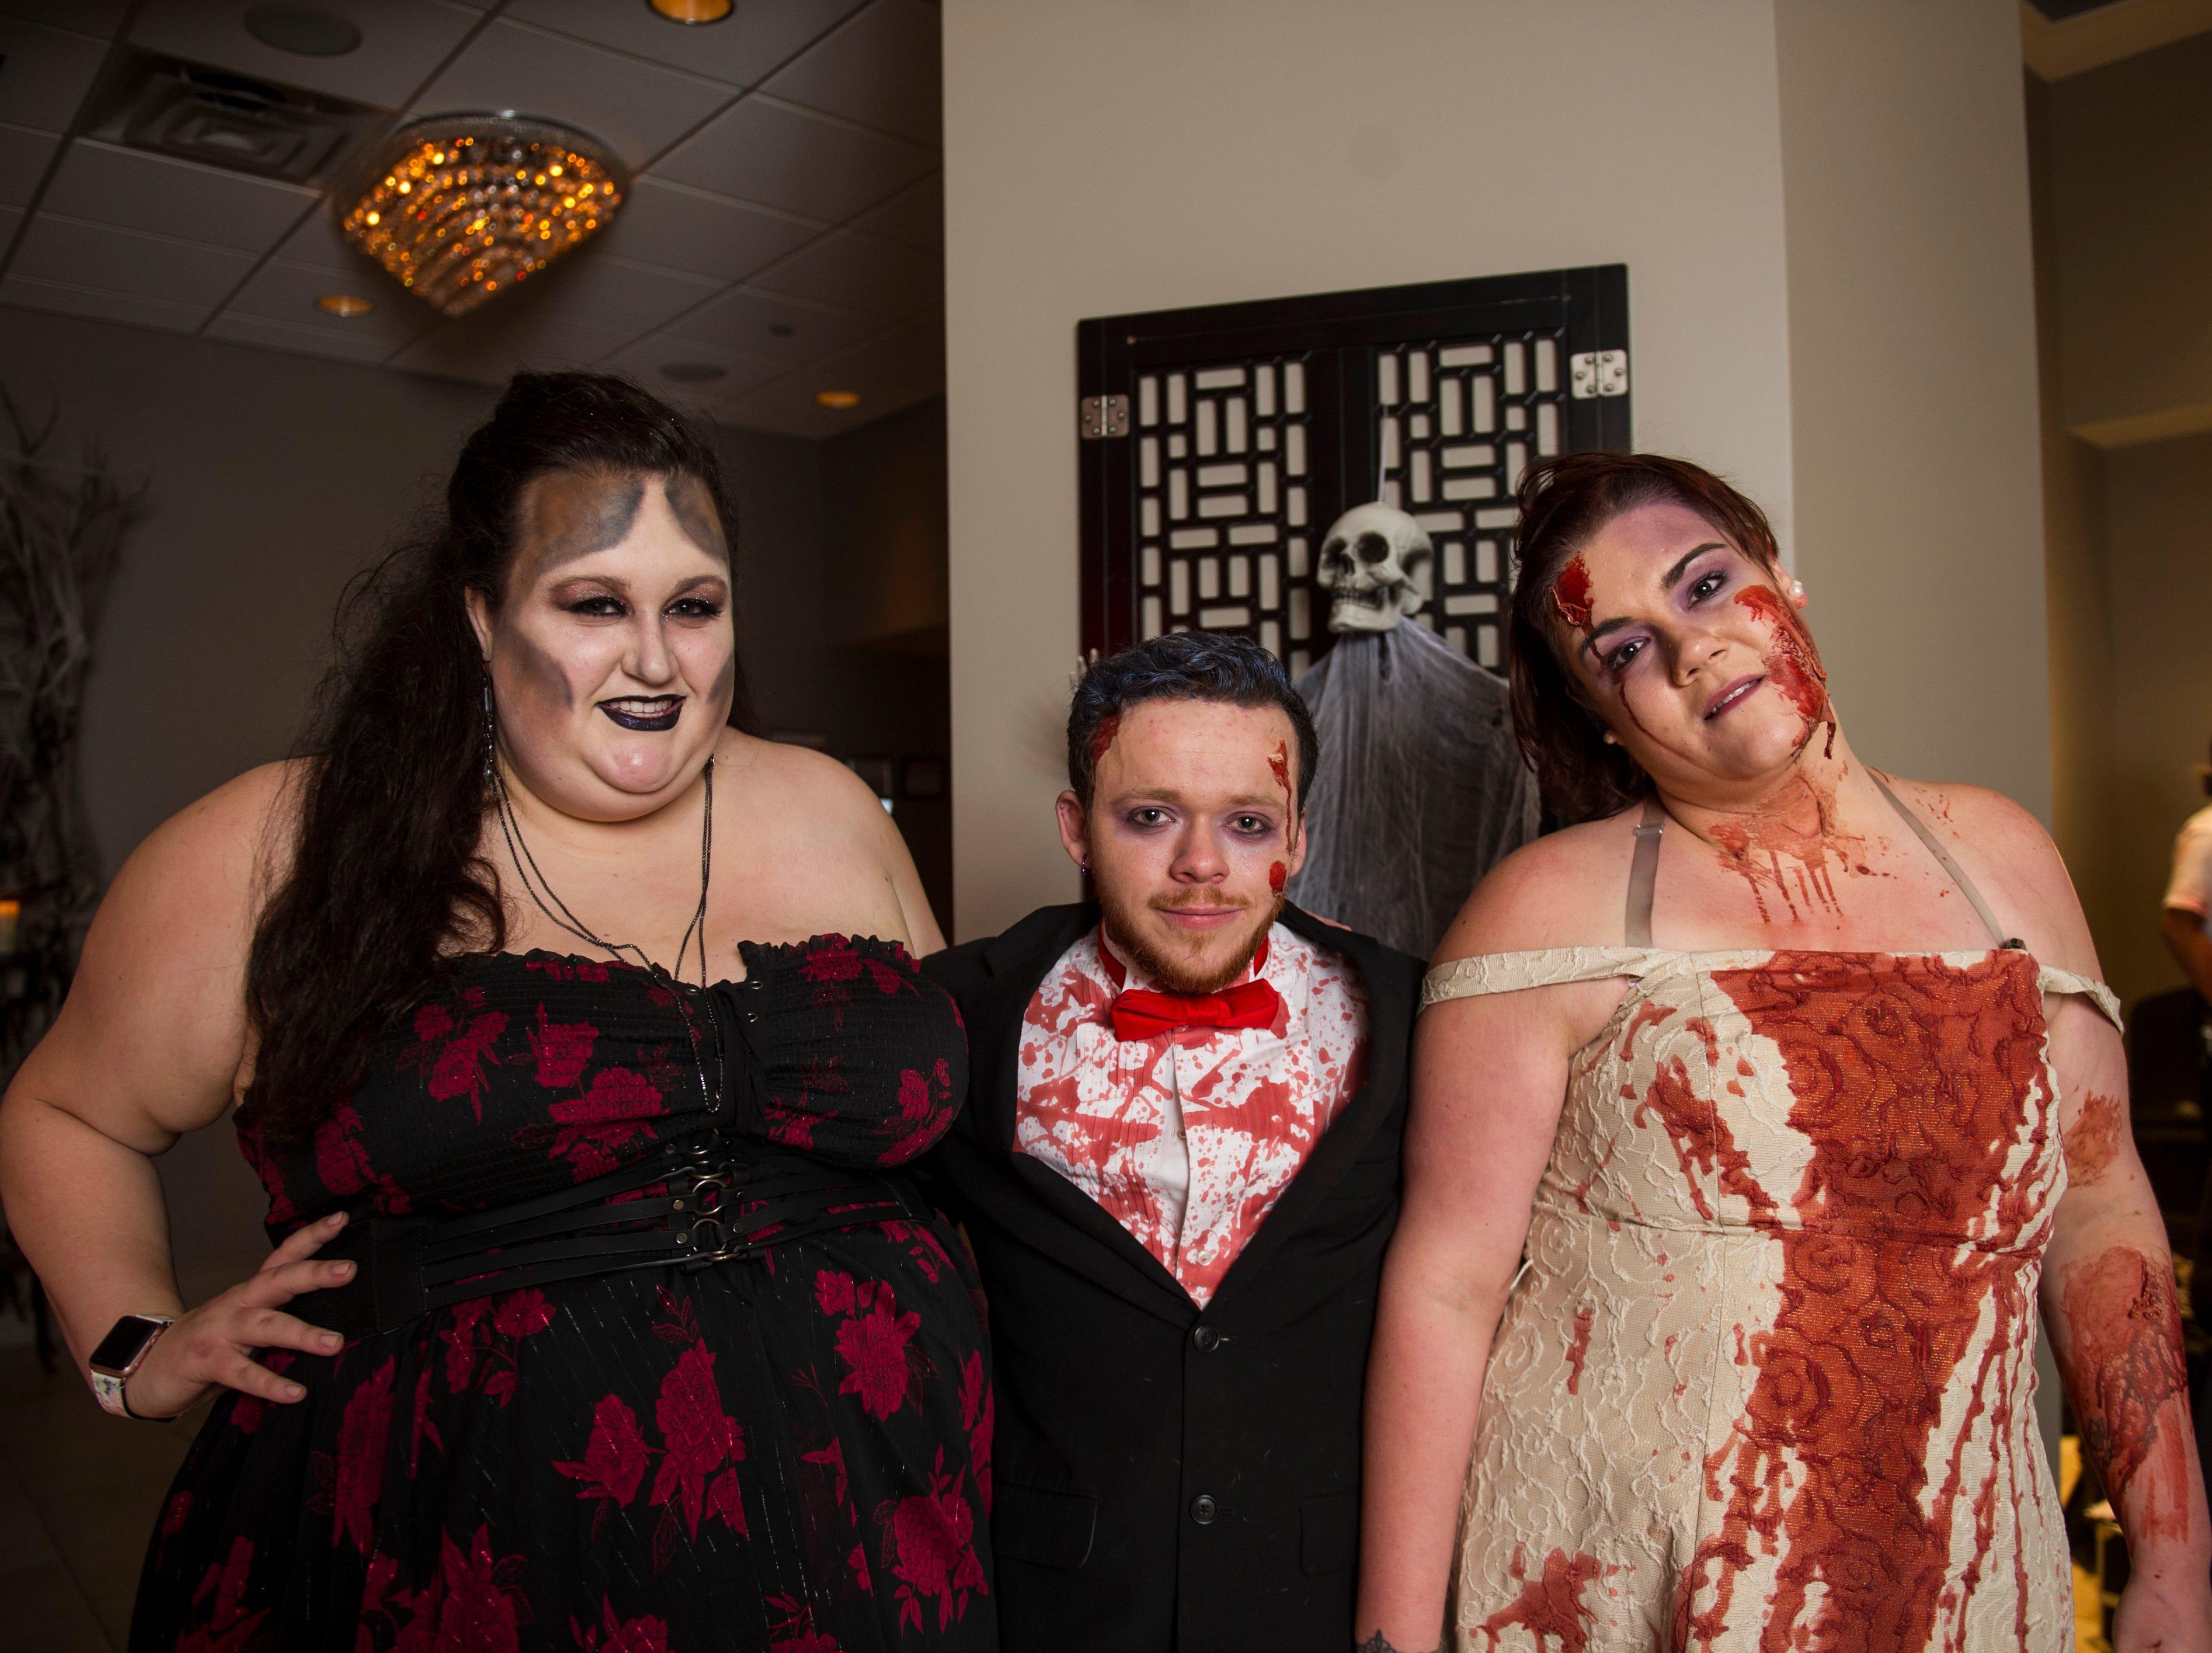 Katie Anderson, Kayden Boyett, Amanda Cruz at the Zombie Prom on Saturday, Oct. 20, 2018.